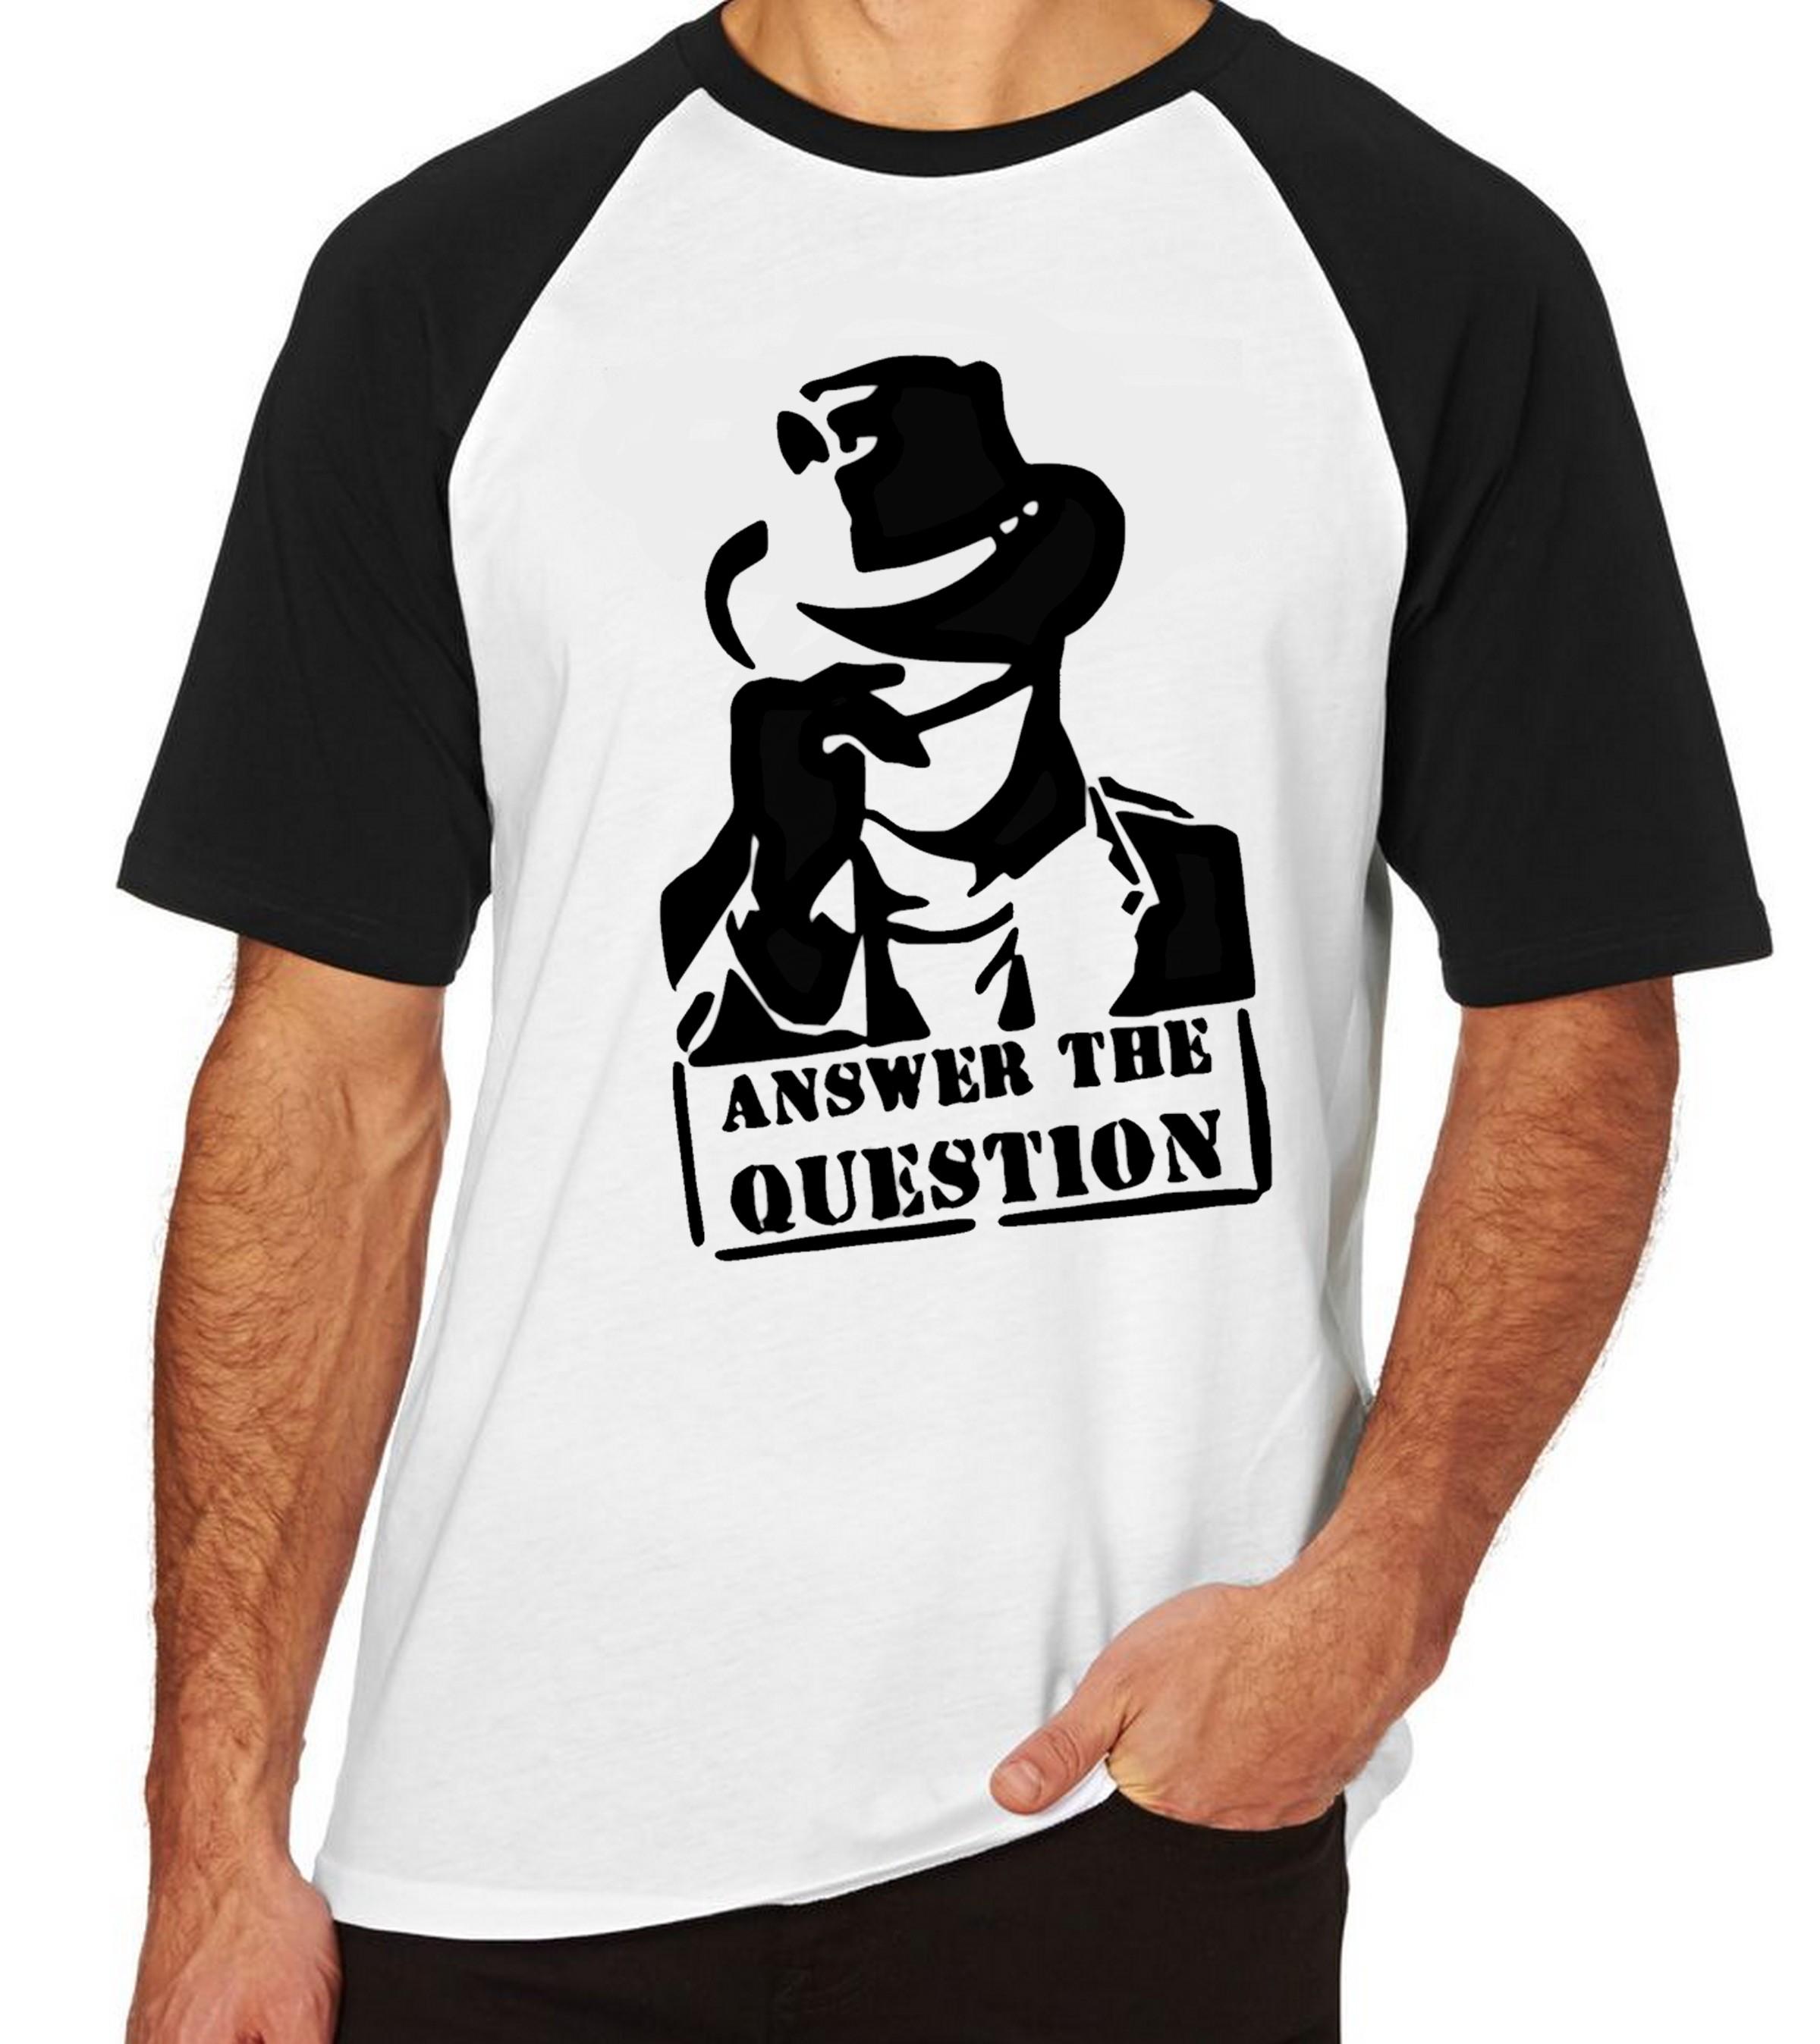 Camiseta Raglan Blusa Camisa Unisex Answer The Question  34308770b65